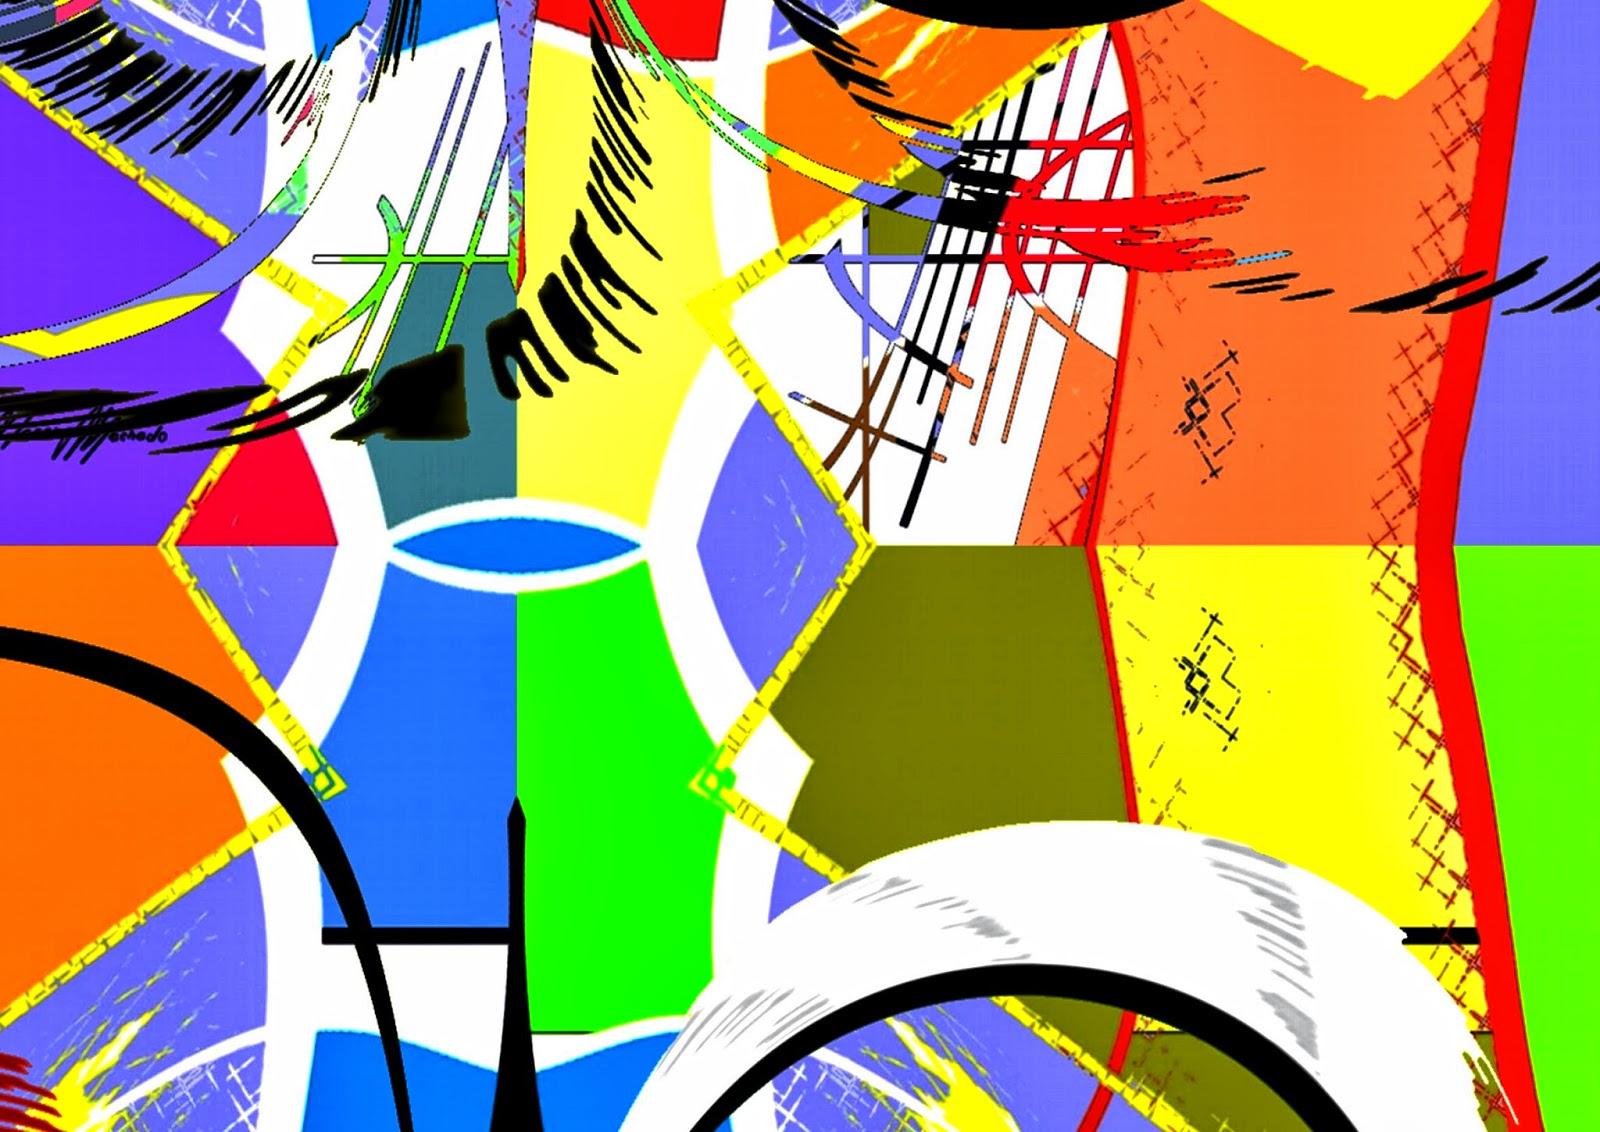 Palácio das Artes   Atelier Digital   Vitrine Fotográfica  Galeria de Gravuras Digital